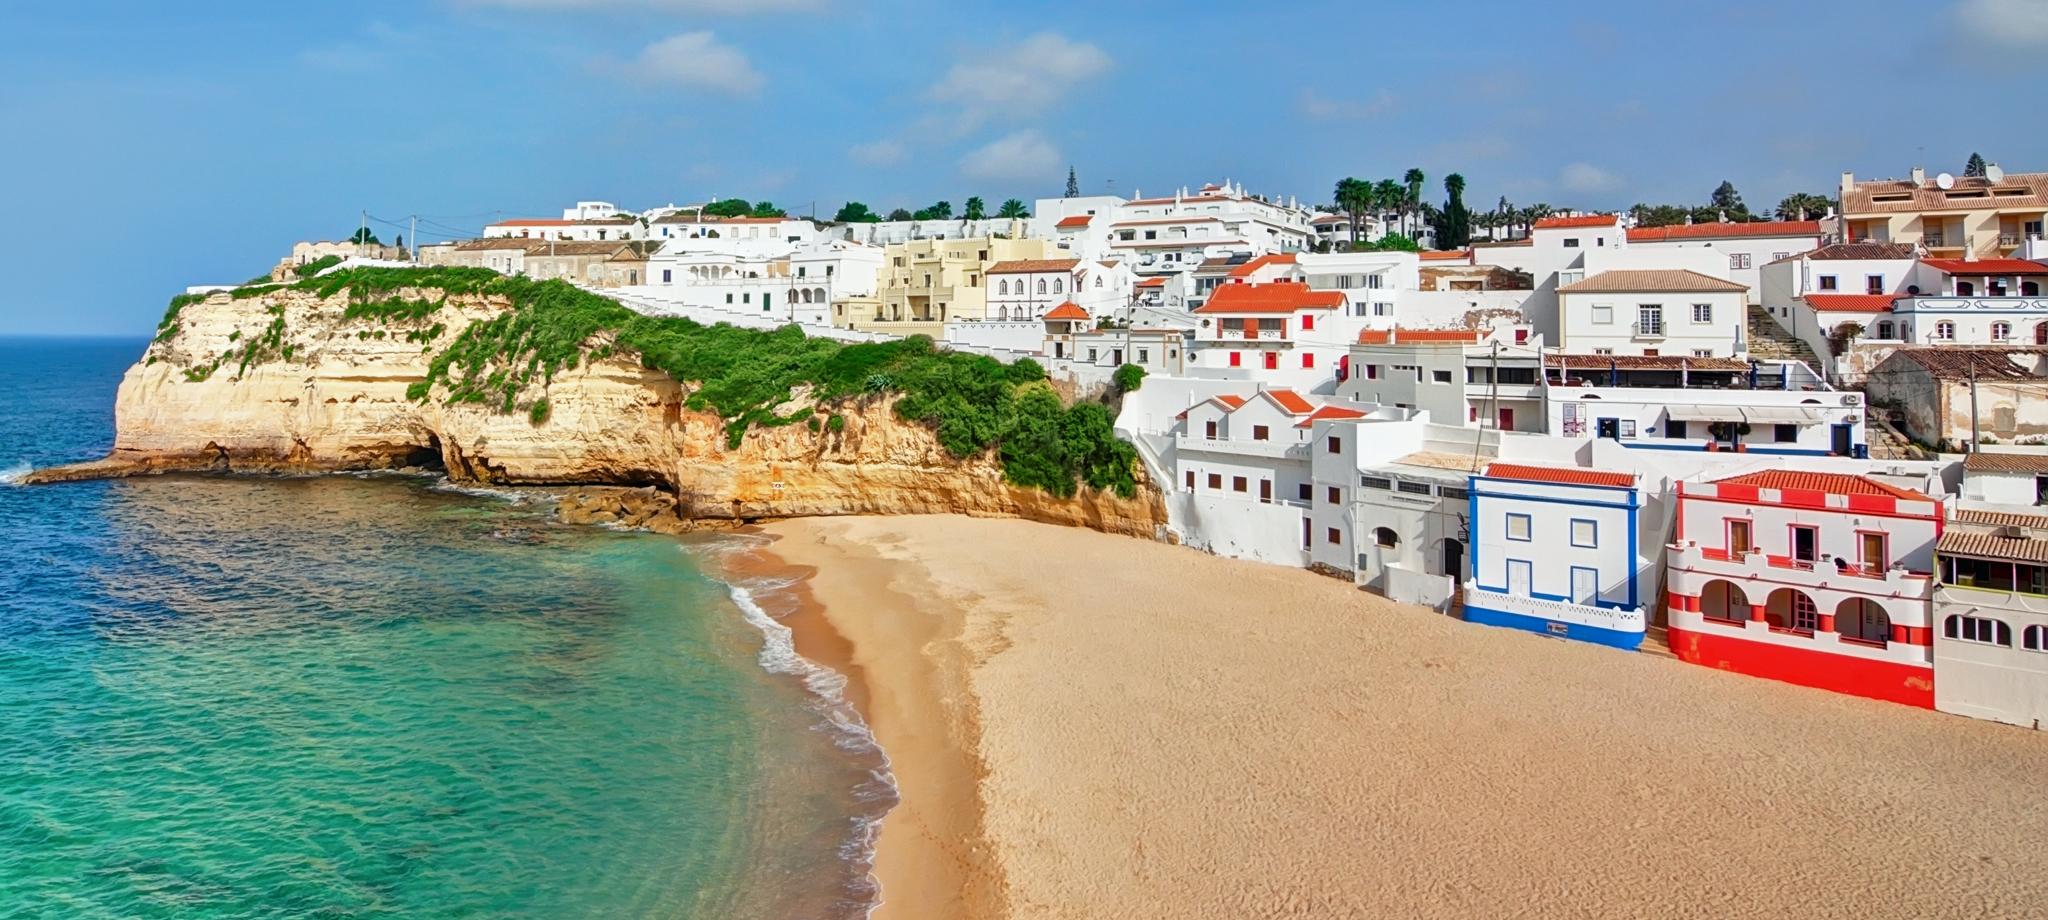 португалия курорты на берегу частности, домами